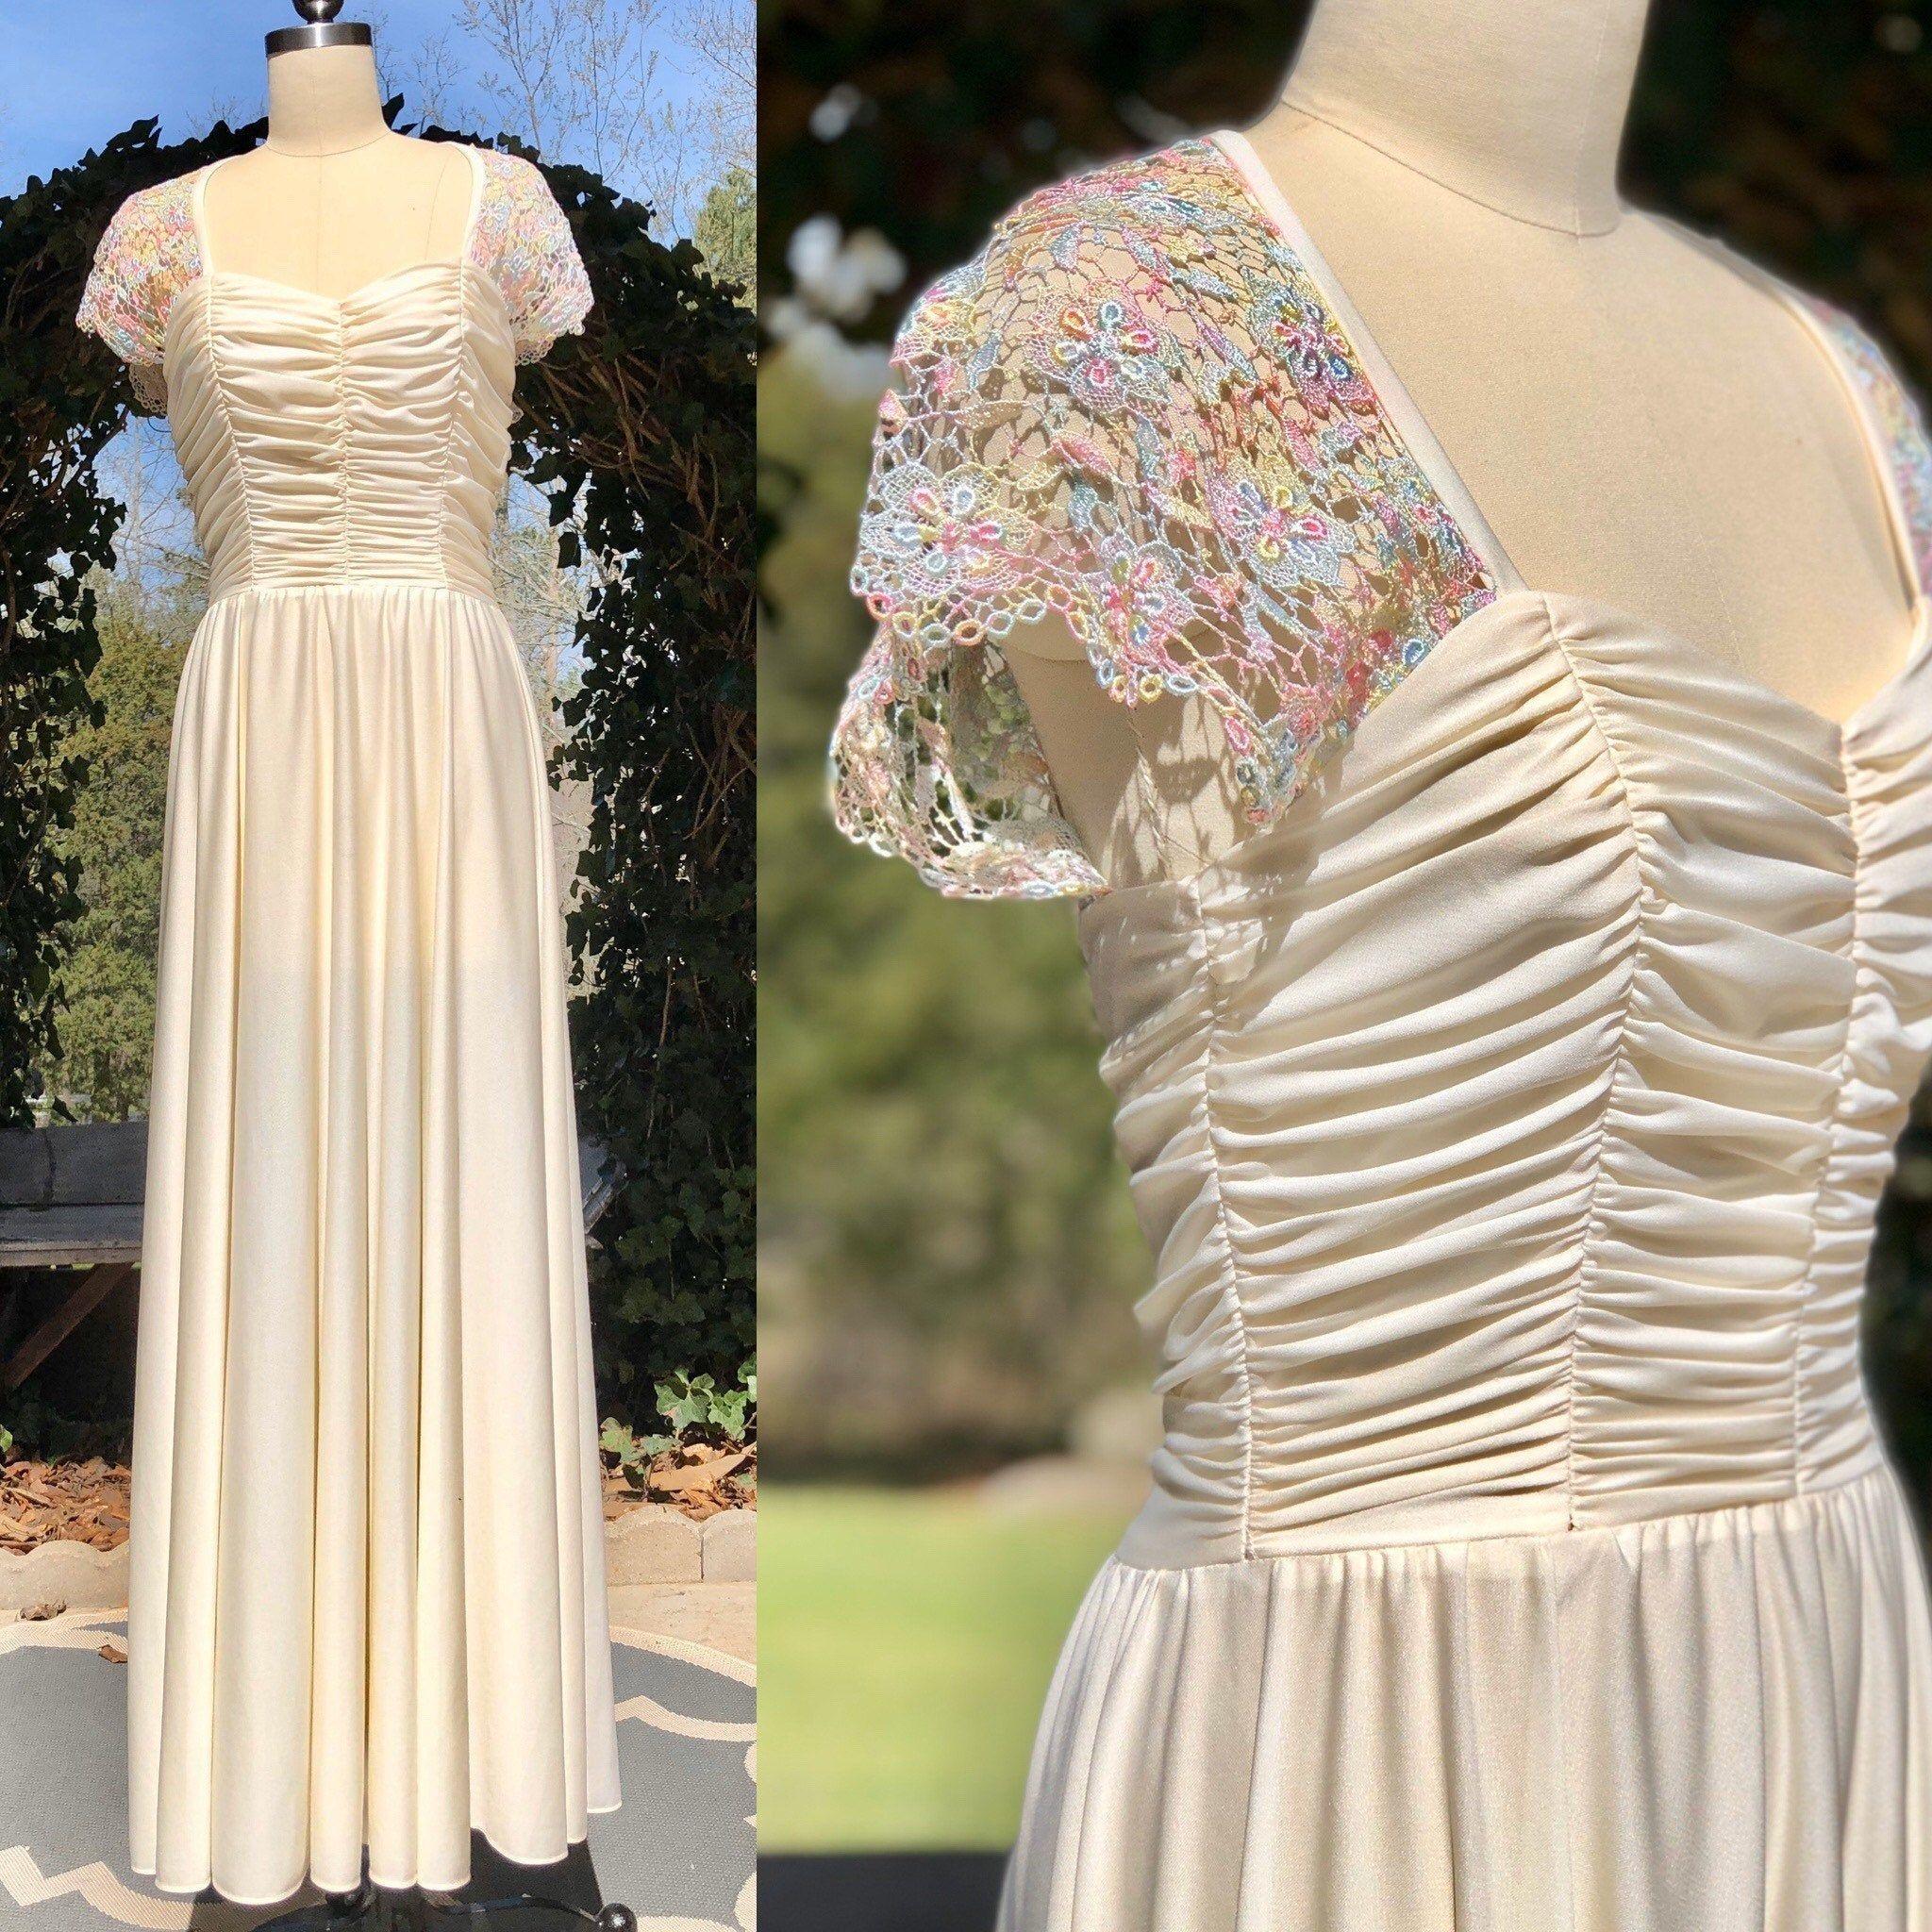 70s Dress Vintage 1970s Dress Maxi White Ivory Jersey Knit Etsy Vintage Dresses Prom Dresses Vintage Dresses [ 2048 x 2048 Pixel ]